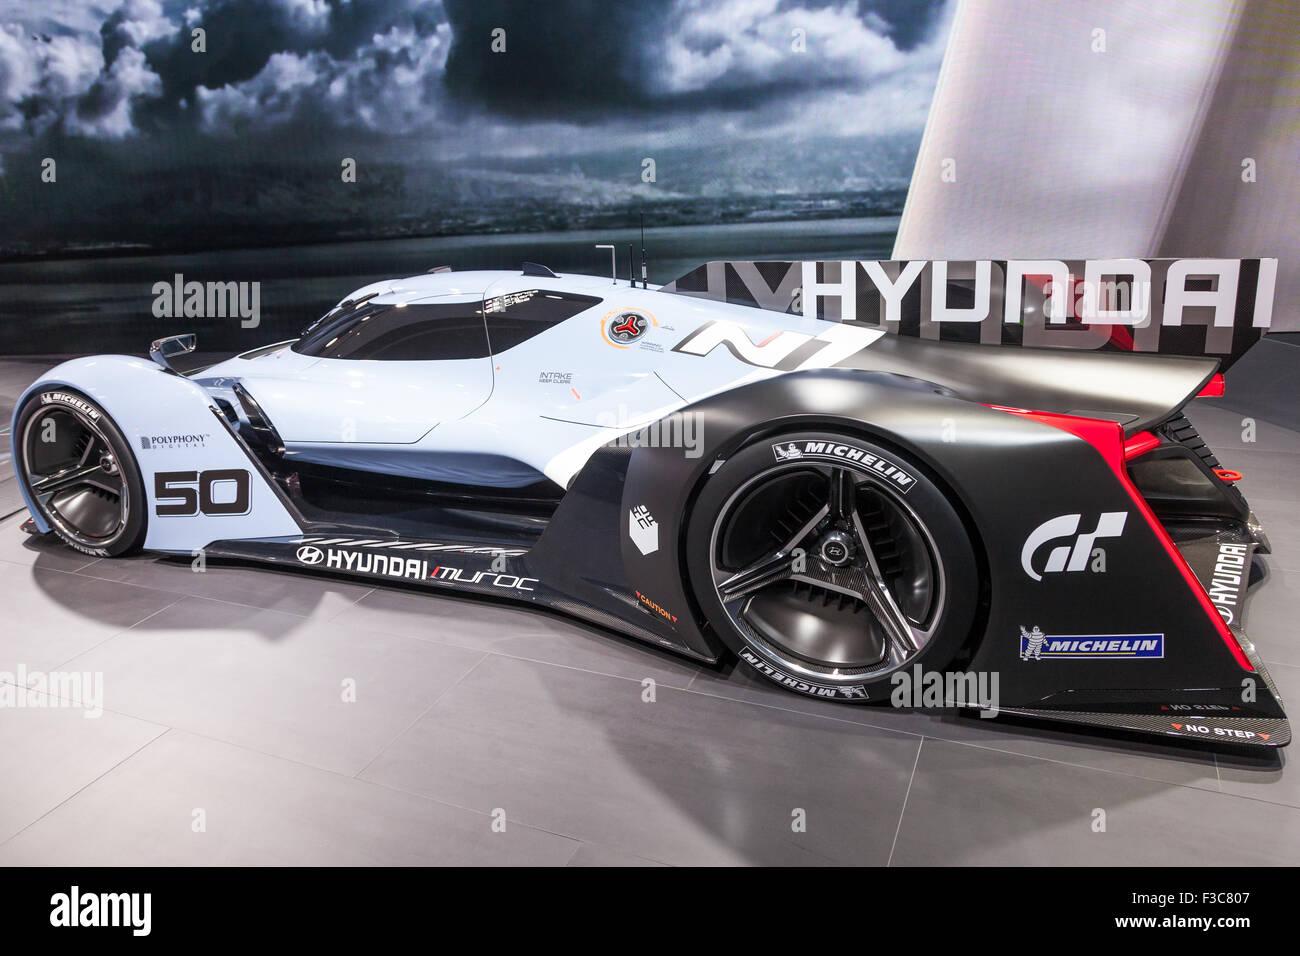 Hyundai Muroc Gran Turismo Super Car at the IAA International Motor Show 2015 - Stock Image